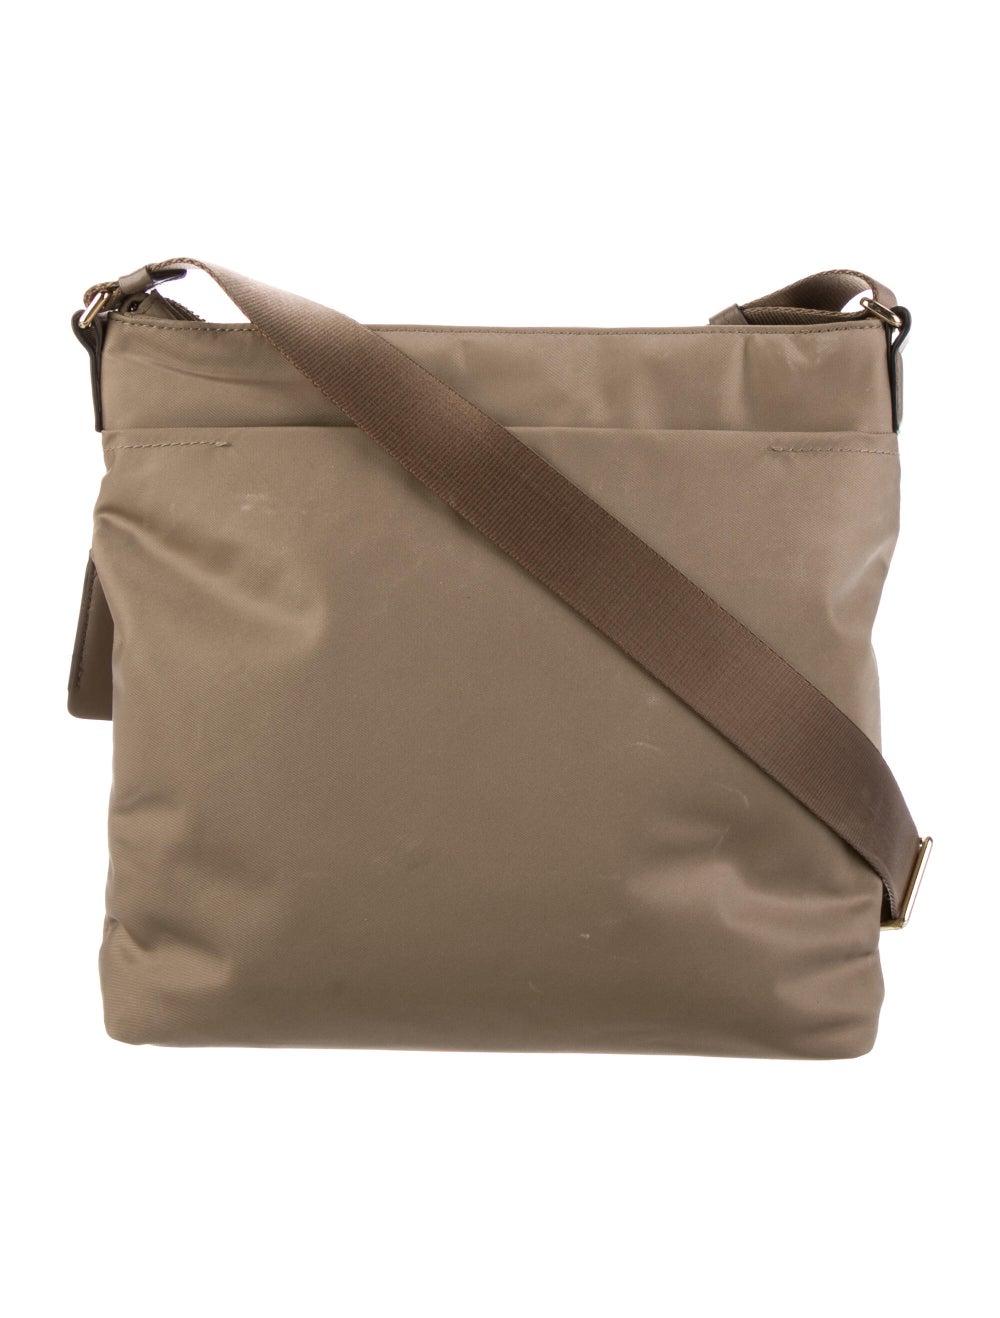 Tumi Nylon SHoulder Bag Gold - image 4